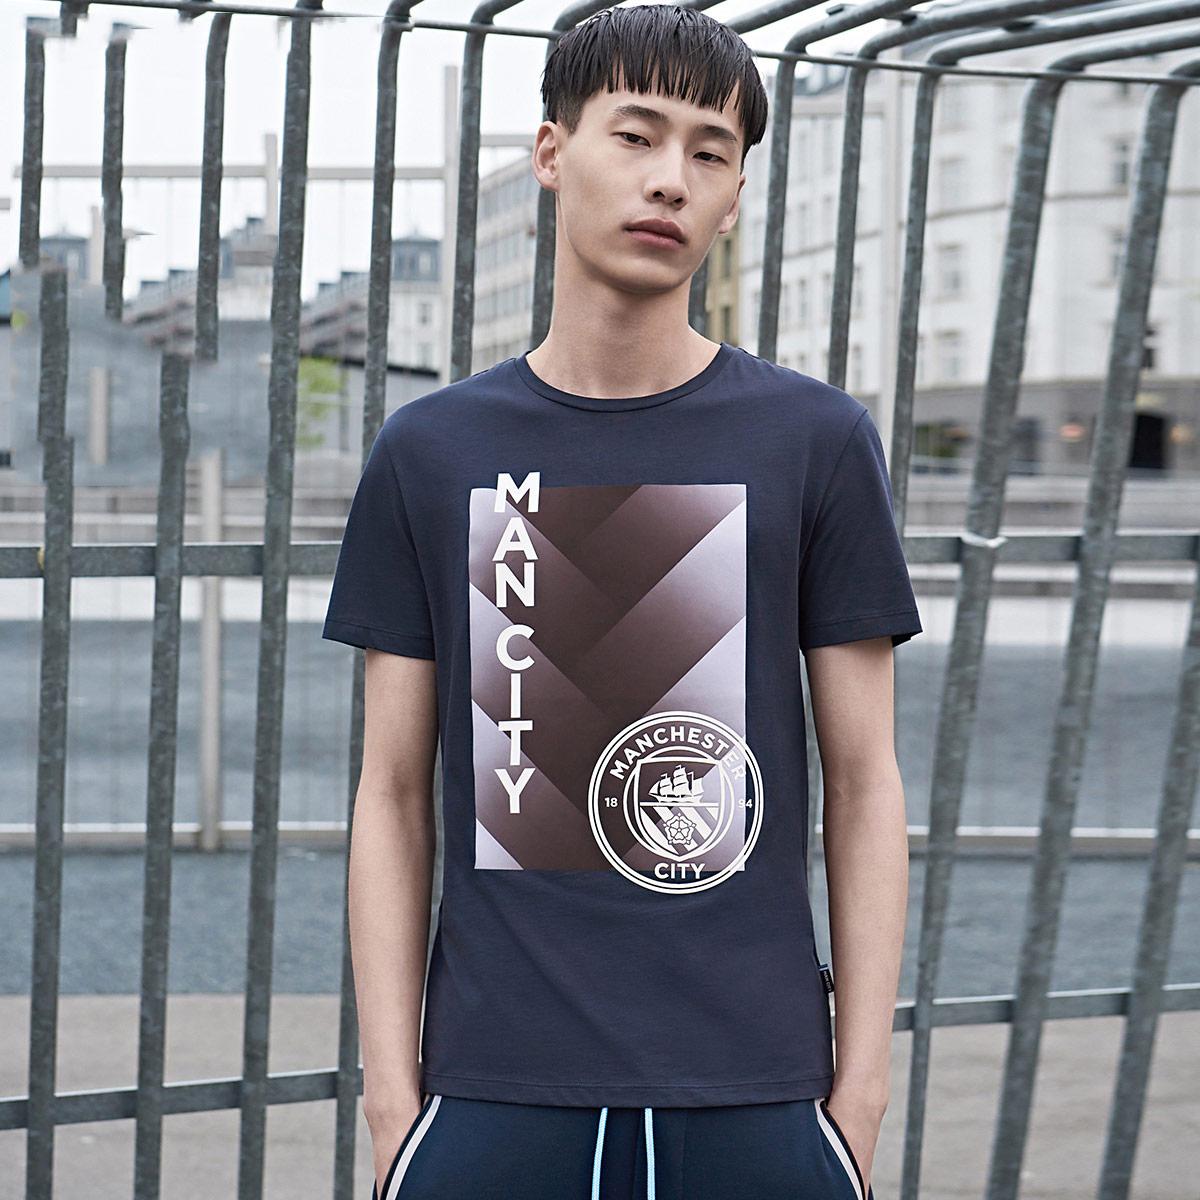 JackJones杰克琼斯足球俱乐部男短袖T恤C|217301542